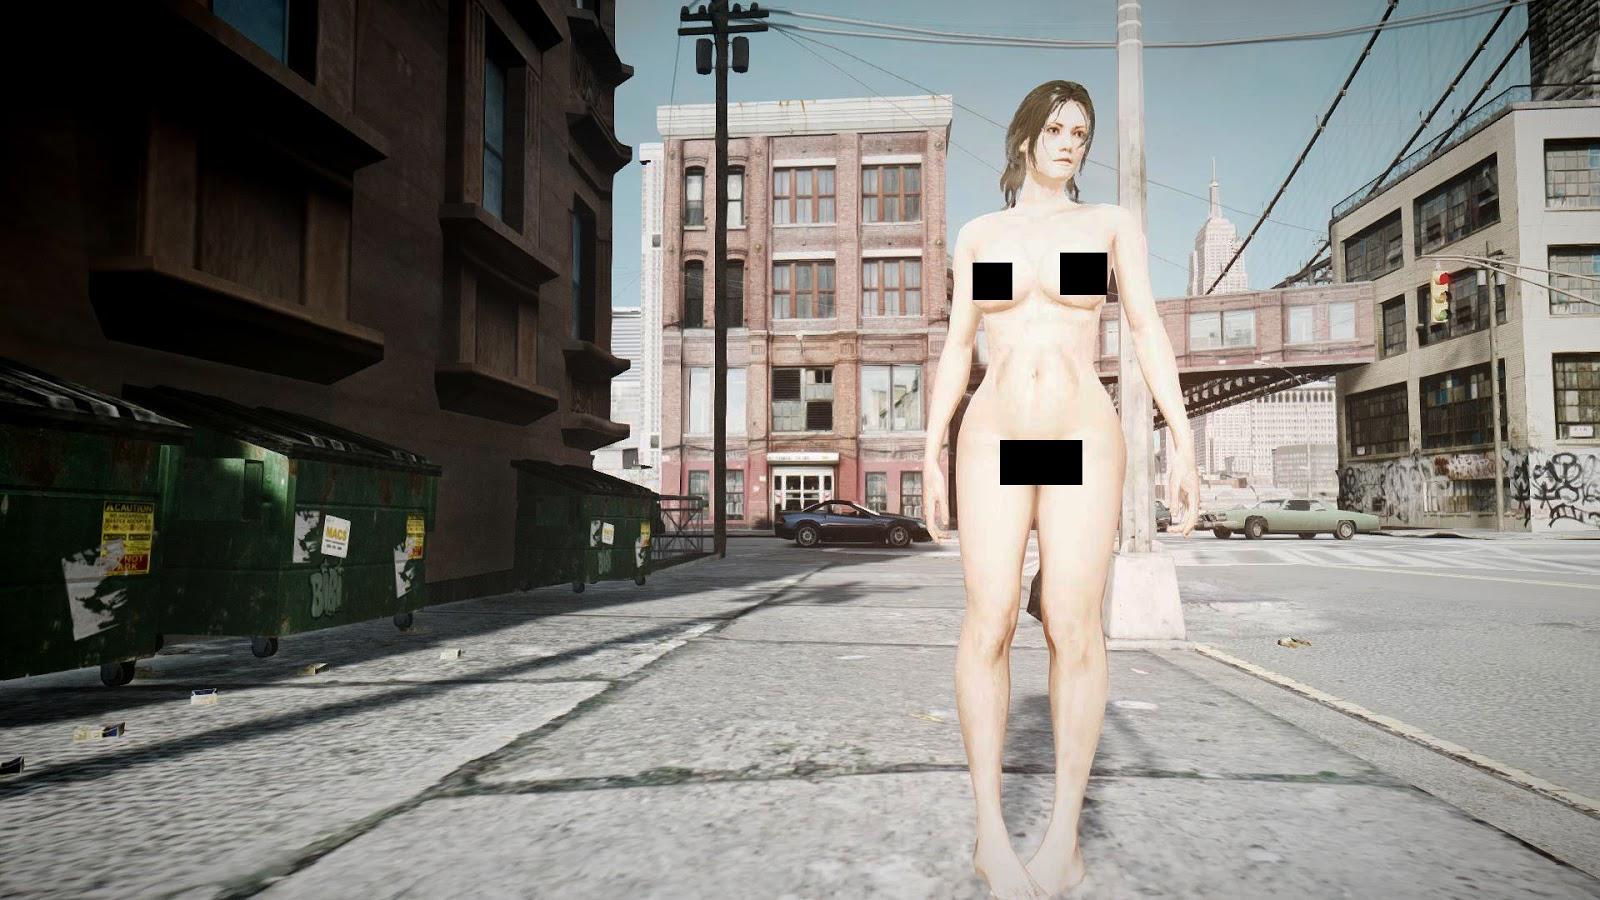 Nude grandtheft auto pics sex image